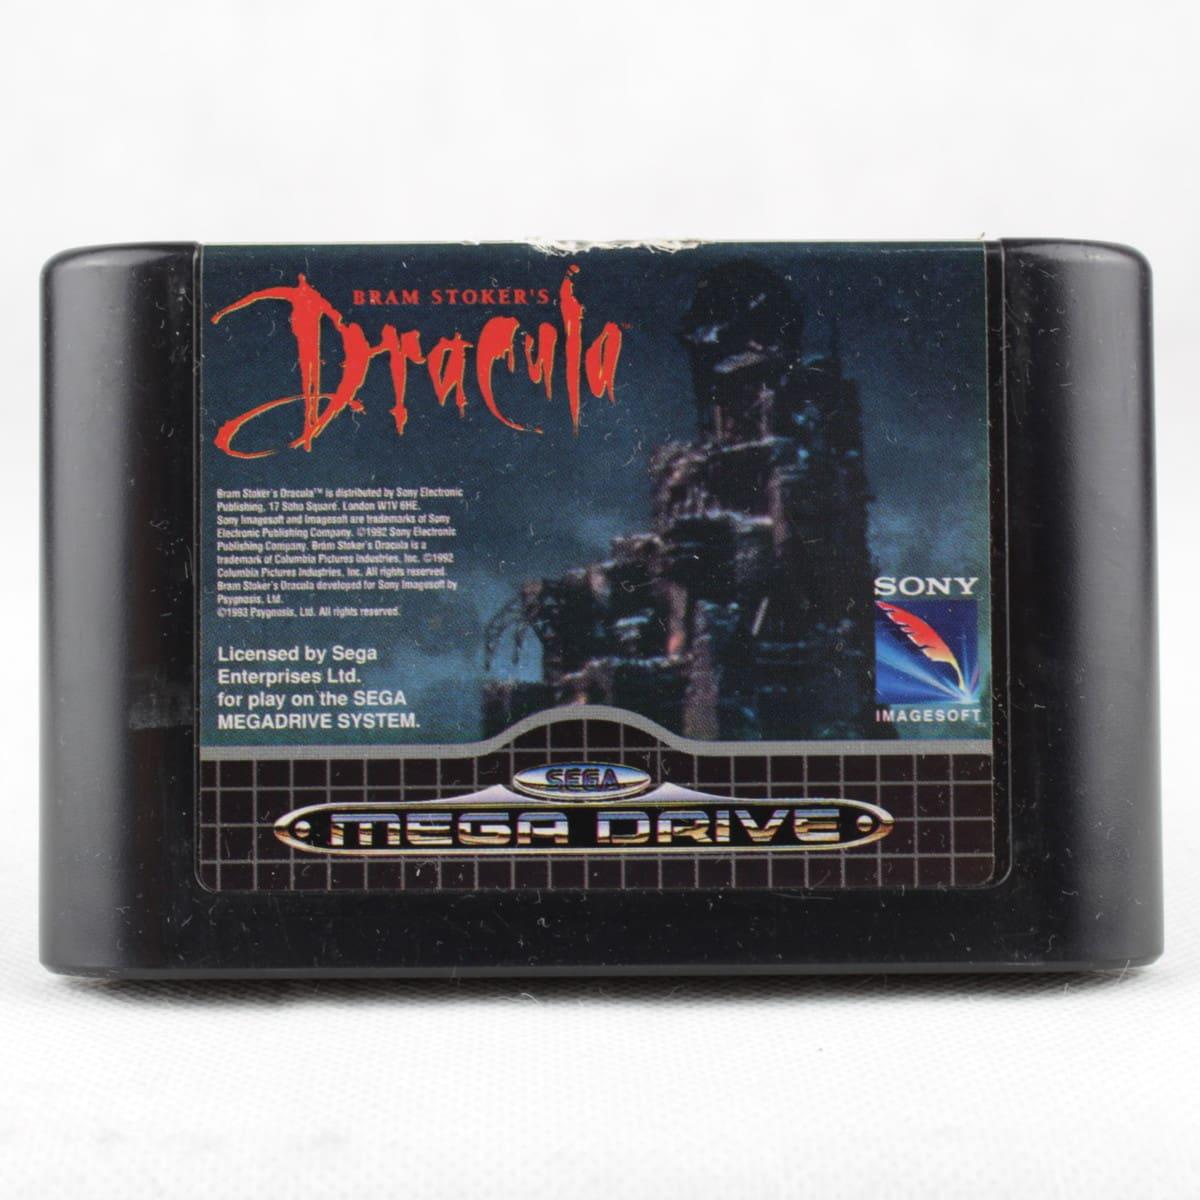 Bram Stoker's Dracula (SEGA Mega Drive - Cartridge)